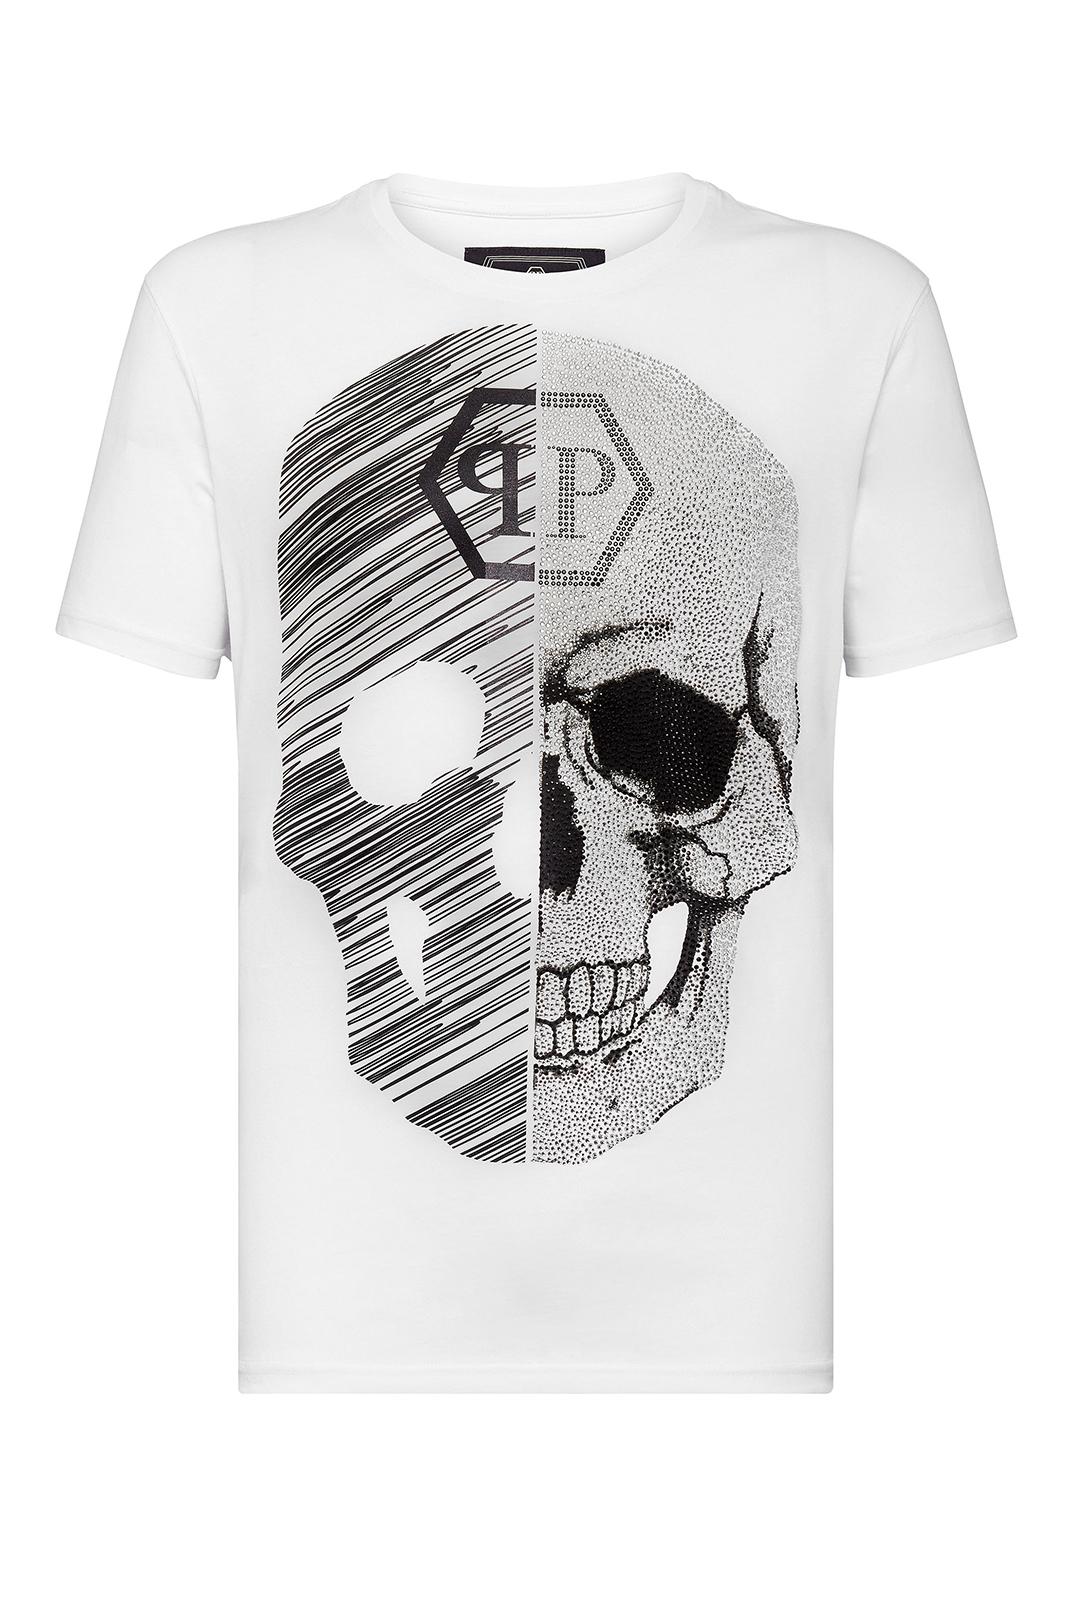 Tee-shirts  Philipp plein MTK3336 NECK SKULL 01 WHITE